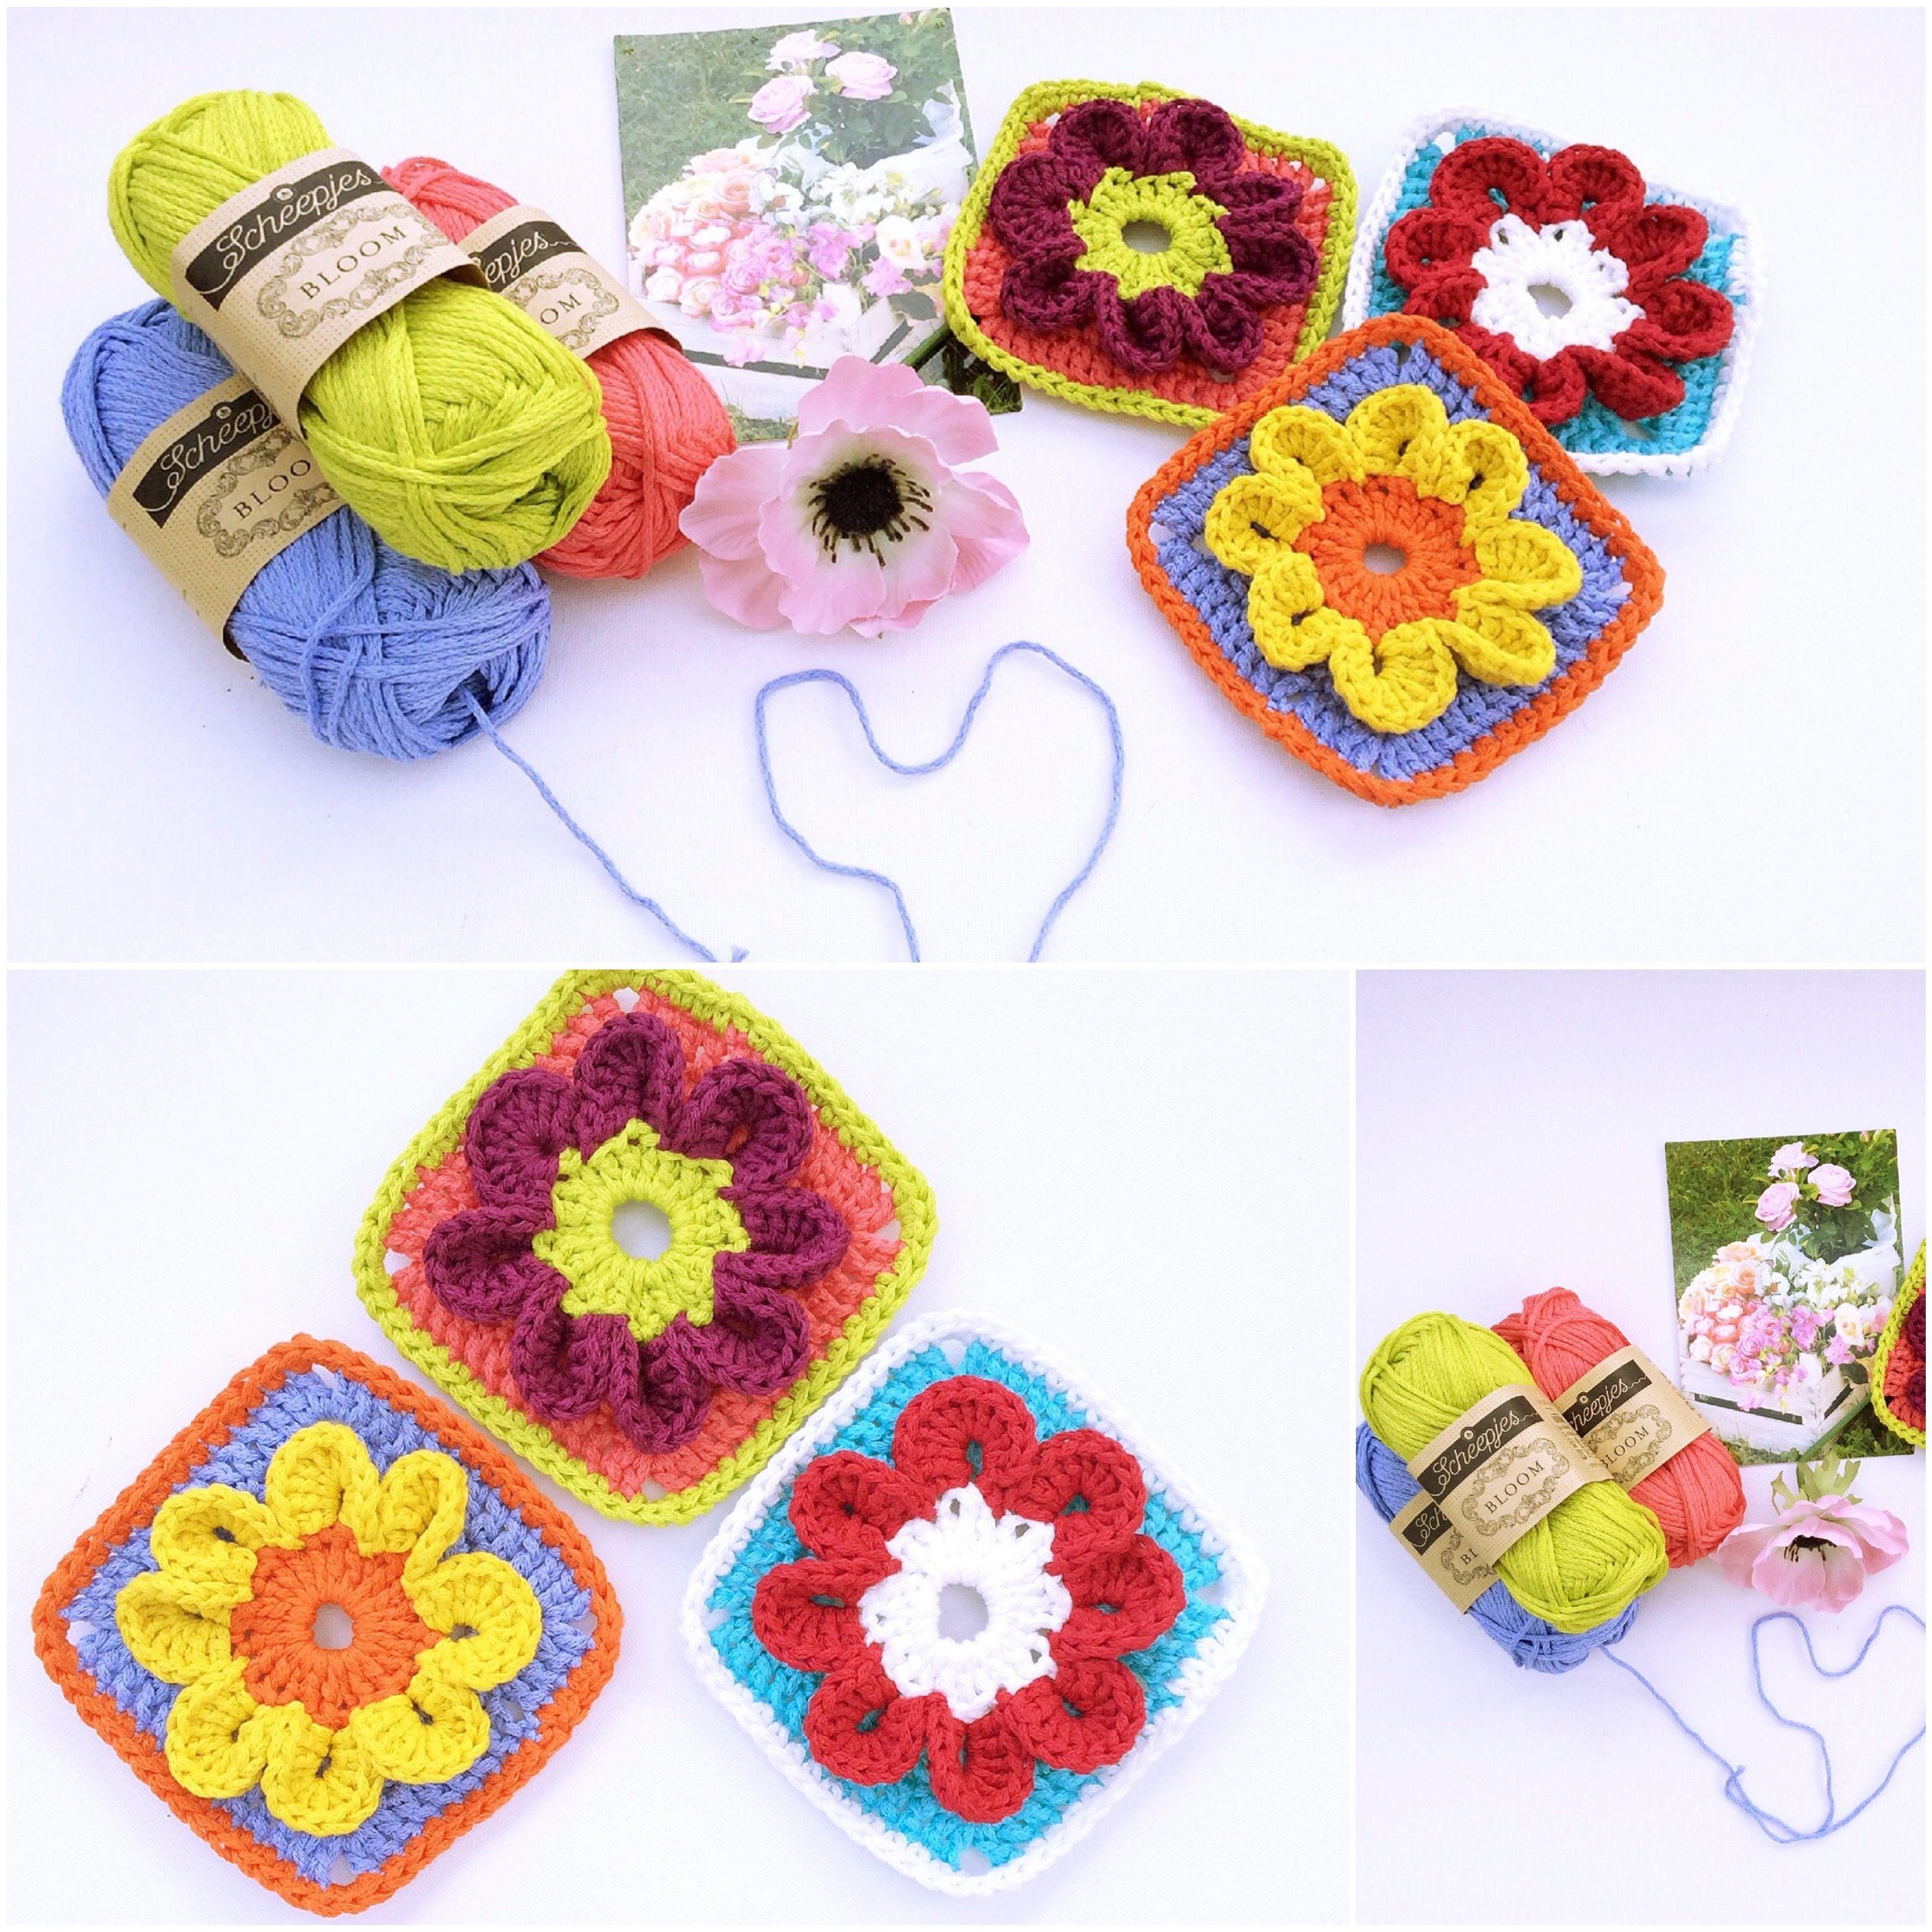 Bloom Crochet Square Free Pattern via www.madewithloops.co.uk